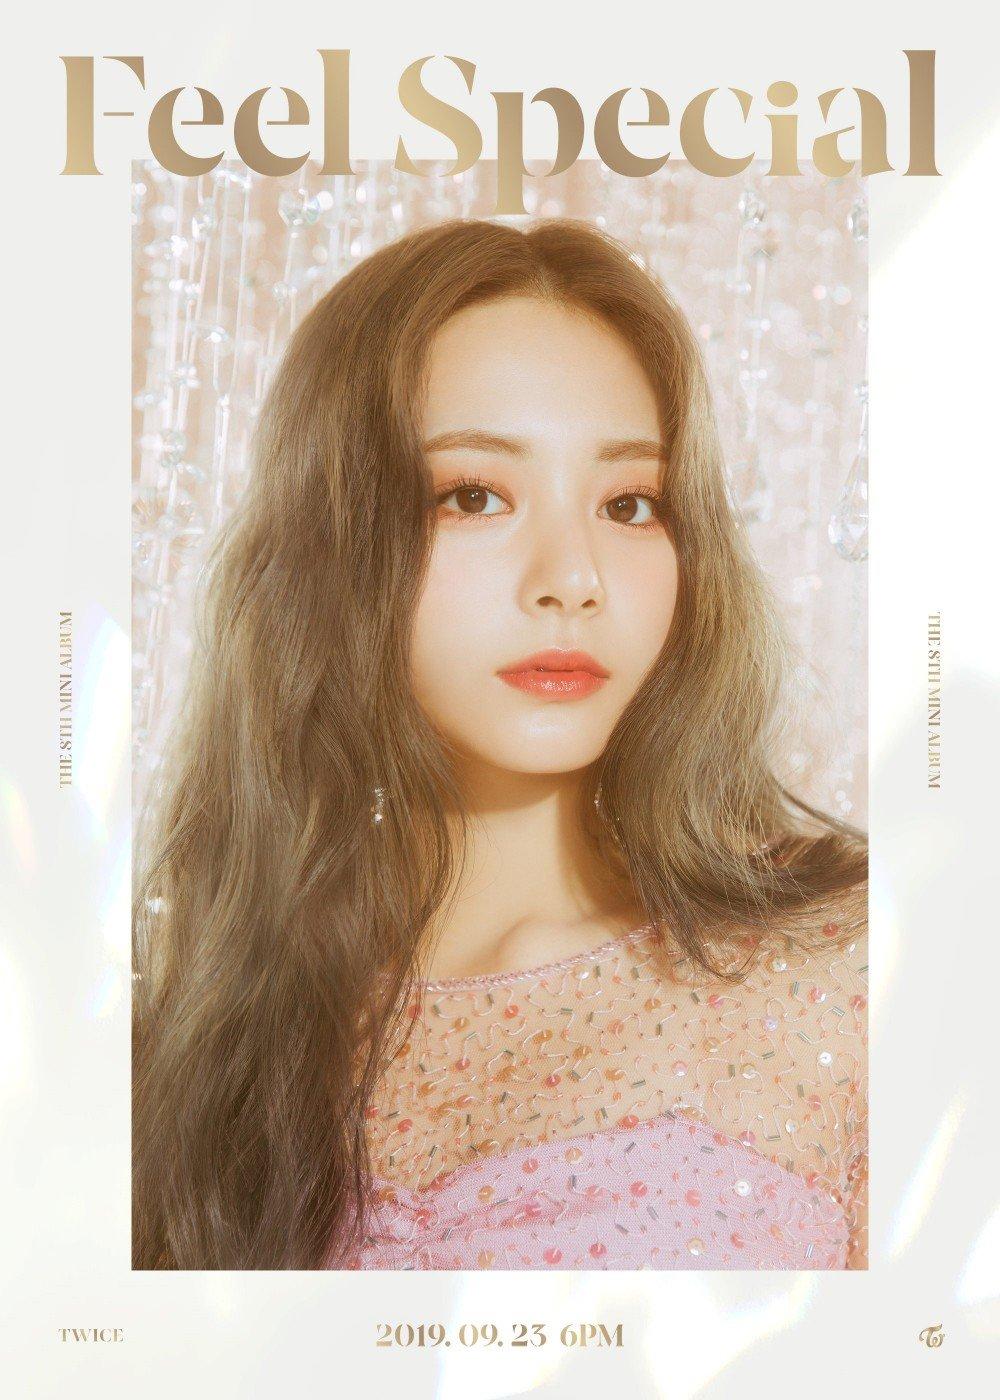 Twices Tzuyu Chaeyoung And Dahyun Boast Stunning Visuals